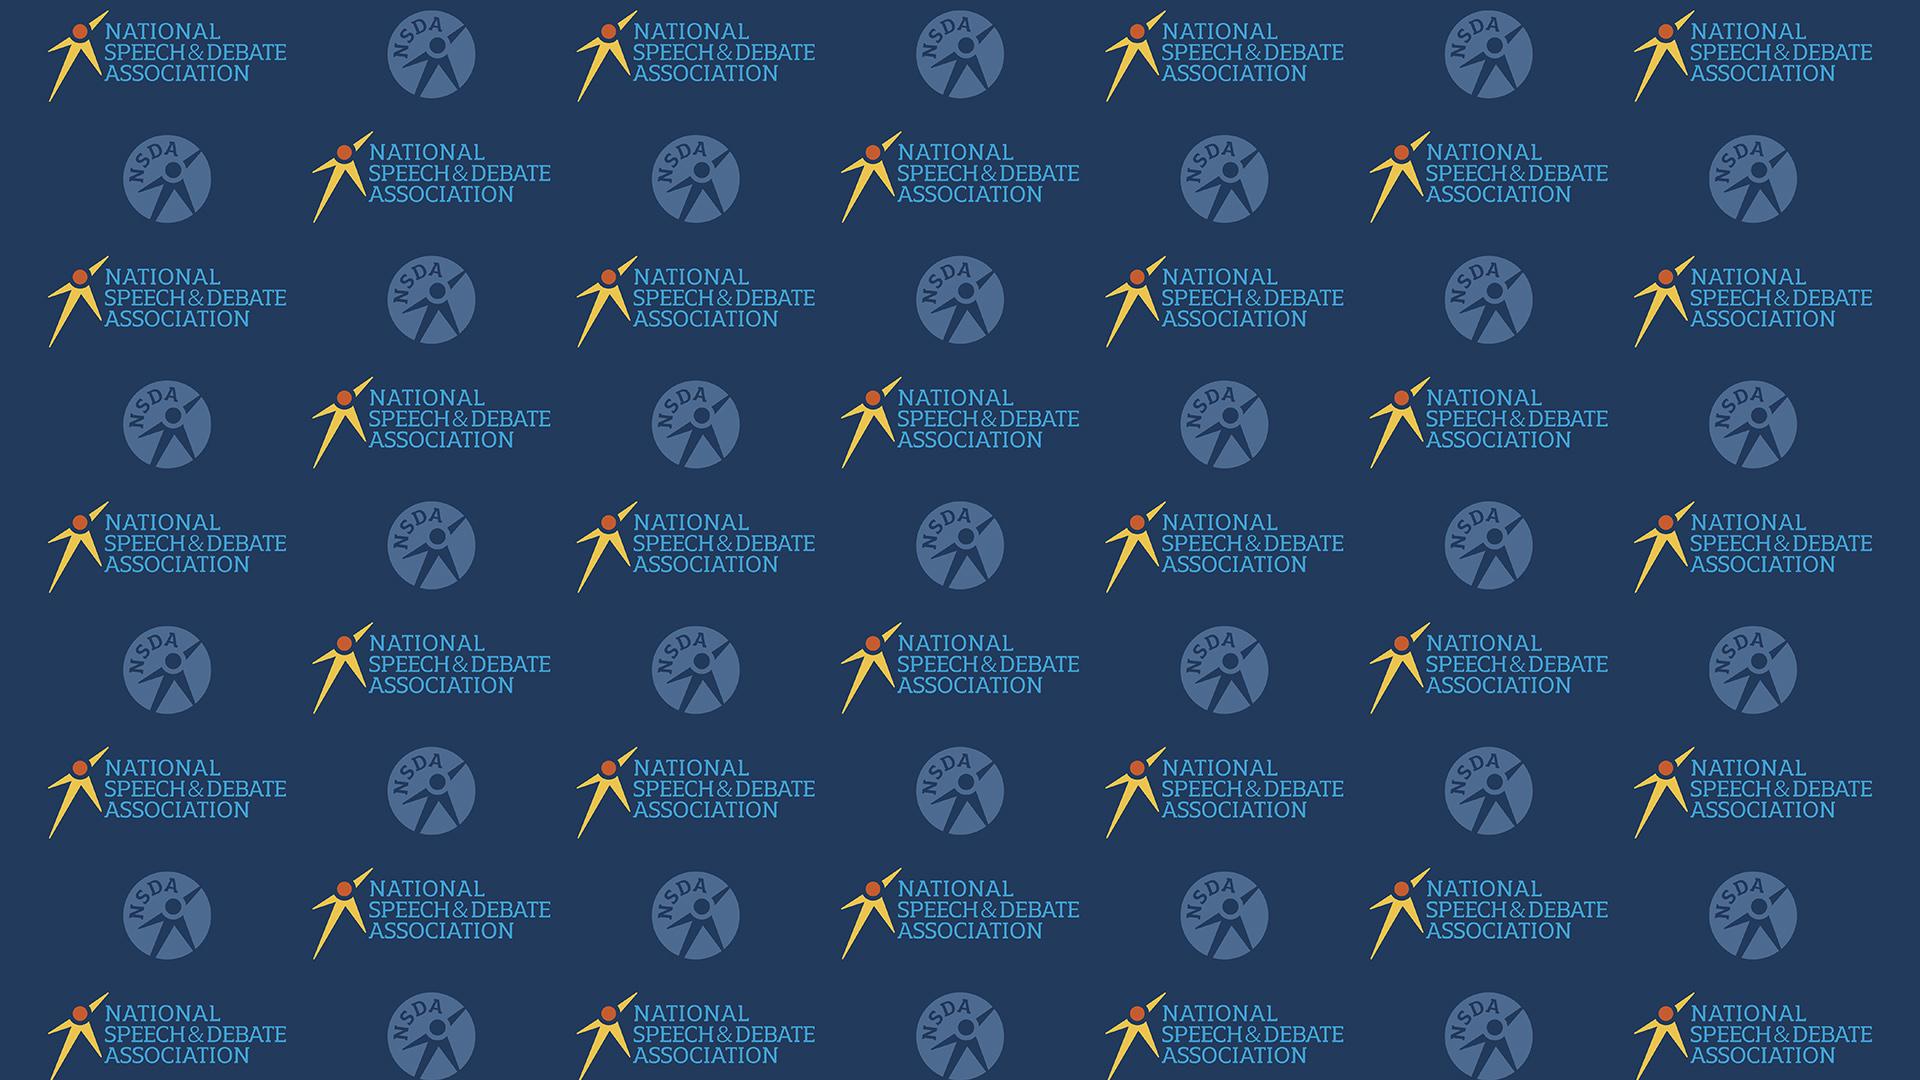 NSDA Logo Background